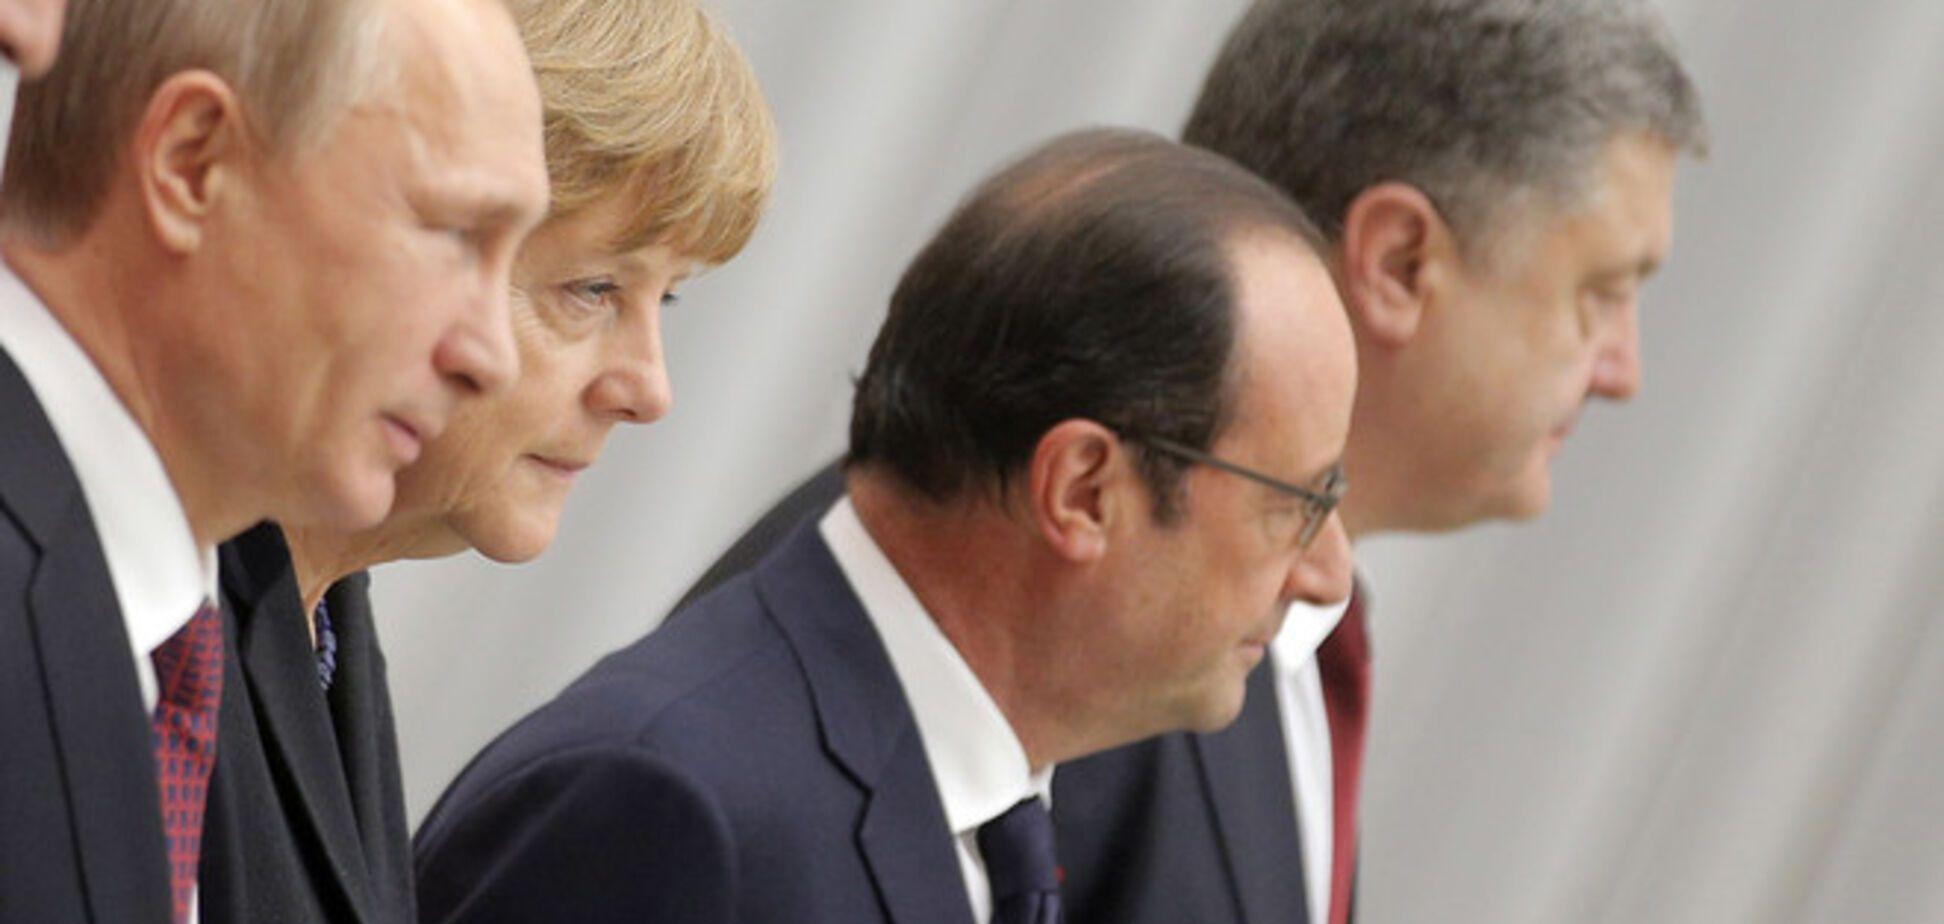 План Путина на минских переговорах провалился – политолог